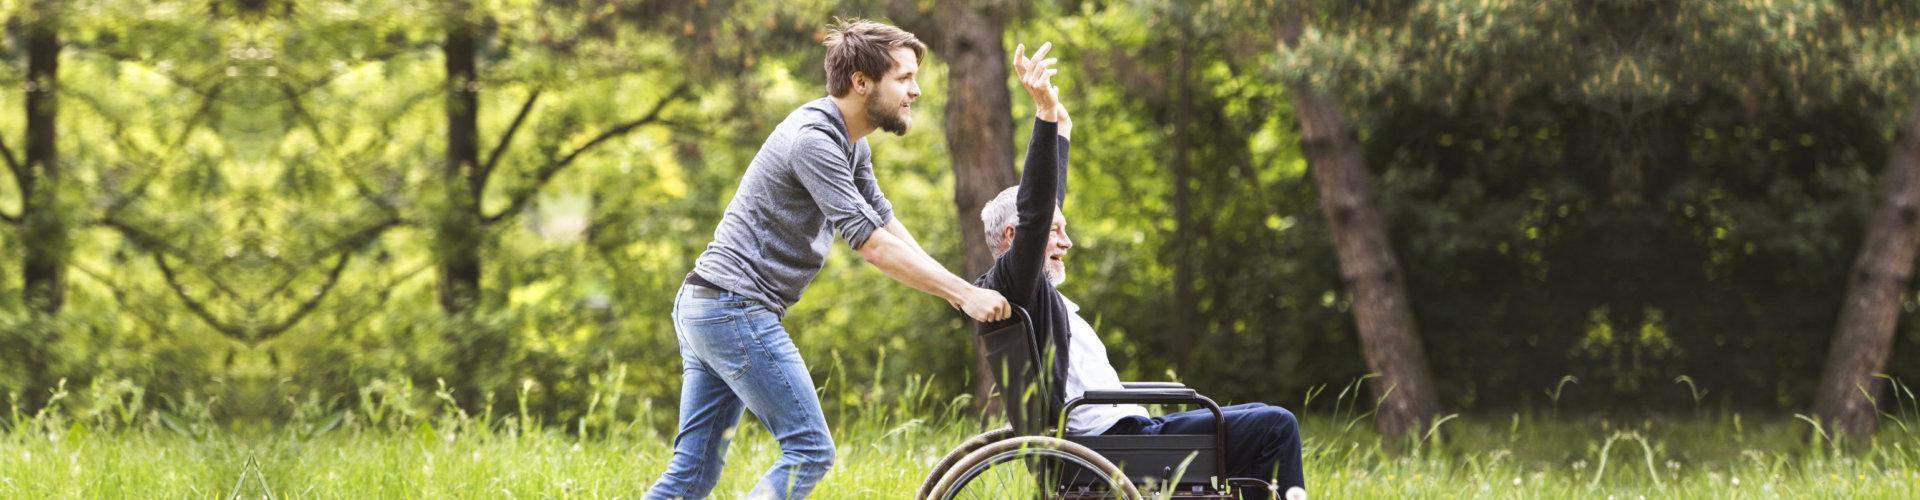 senior man on a wheelchair having fun with his caregiver